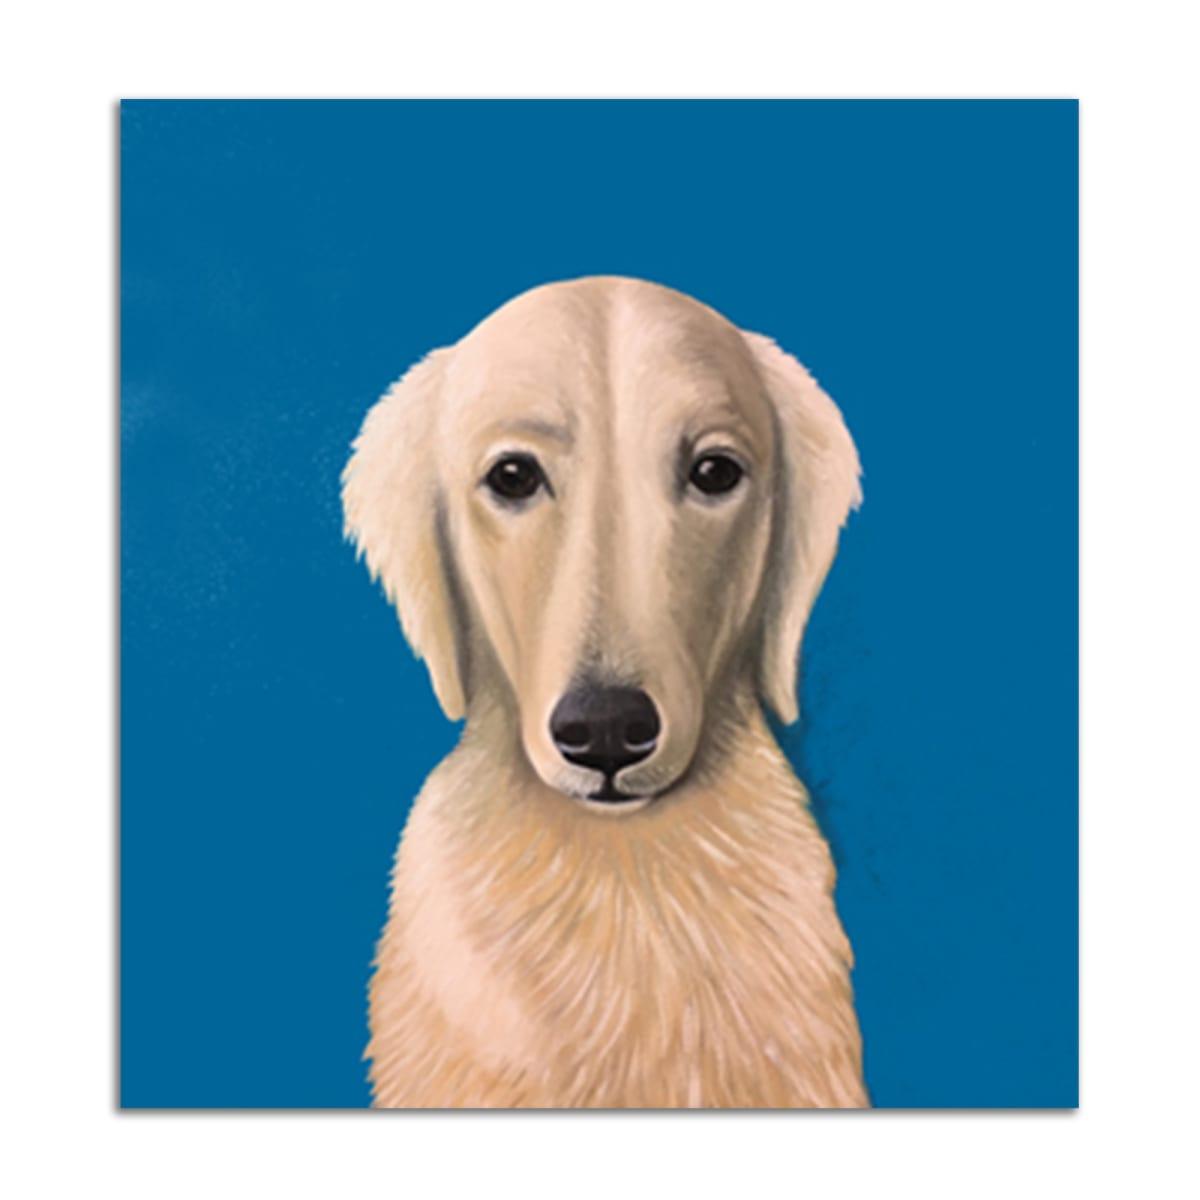 Portrait of Dog by Jane Troup